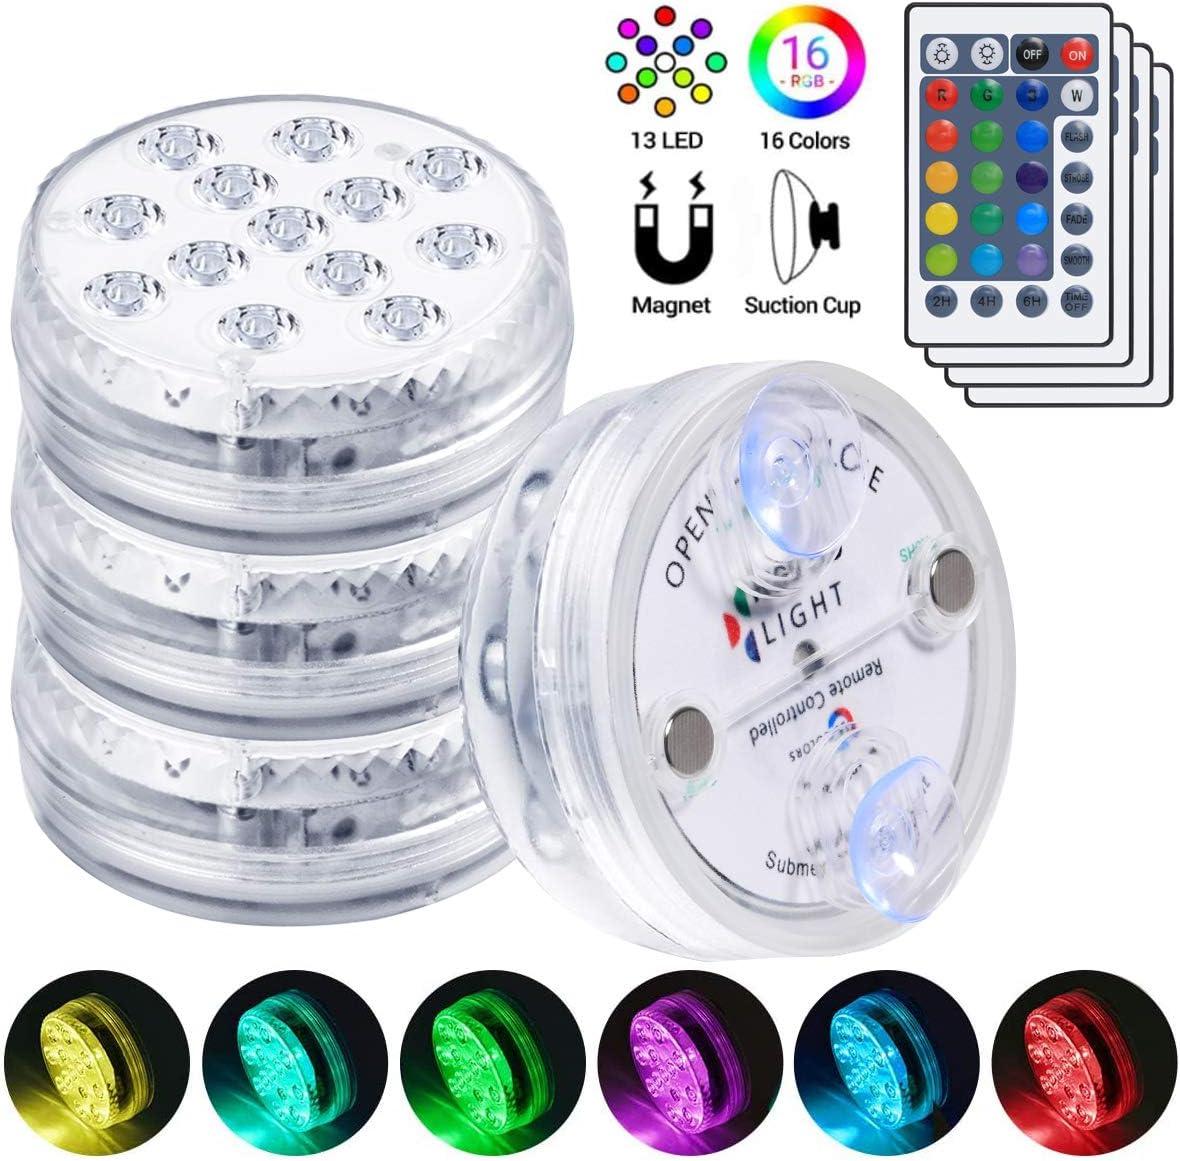 flintronic Luces LED Sumergibles, 4Pcs 13LED RGB Multi cambio de color Piscina Luz LED Impermeable,Control Remoto Bajo El Agua Luz para base de florero, jacuzzi, tanque de peces, Acuario Decoración